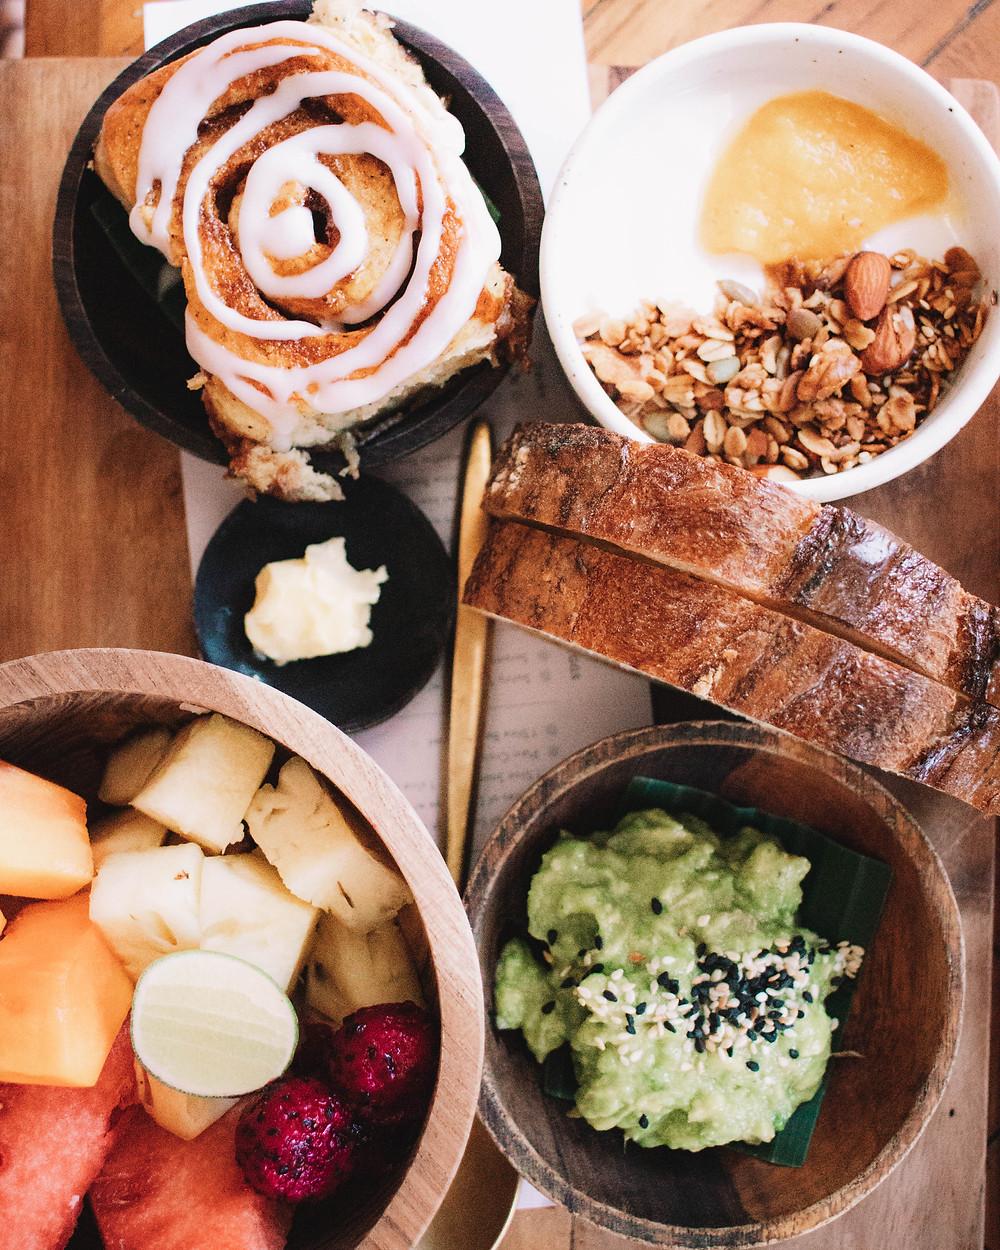 copenhagen canggu brunch cafe cinnamon roll fruit bread